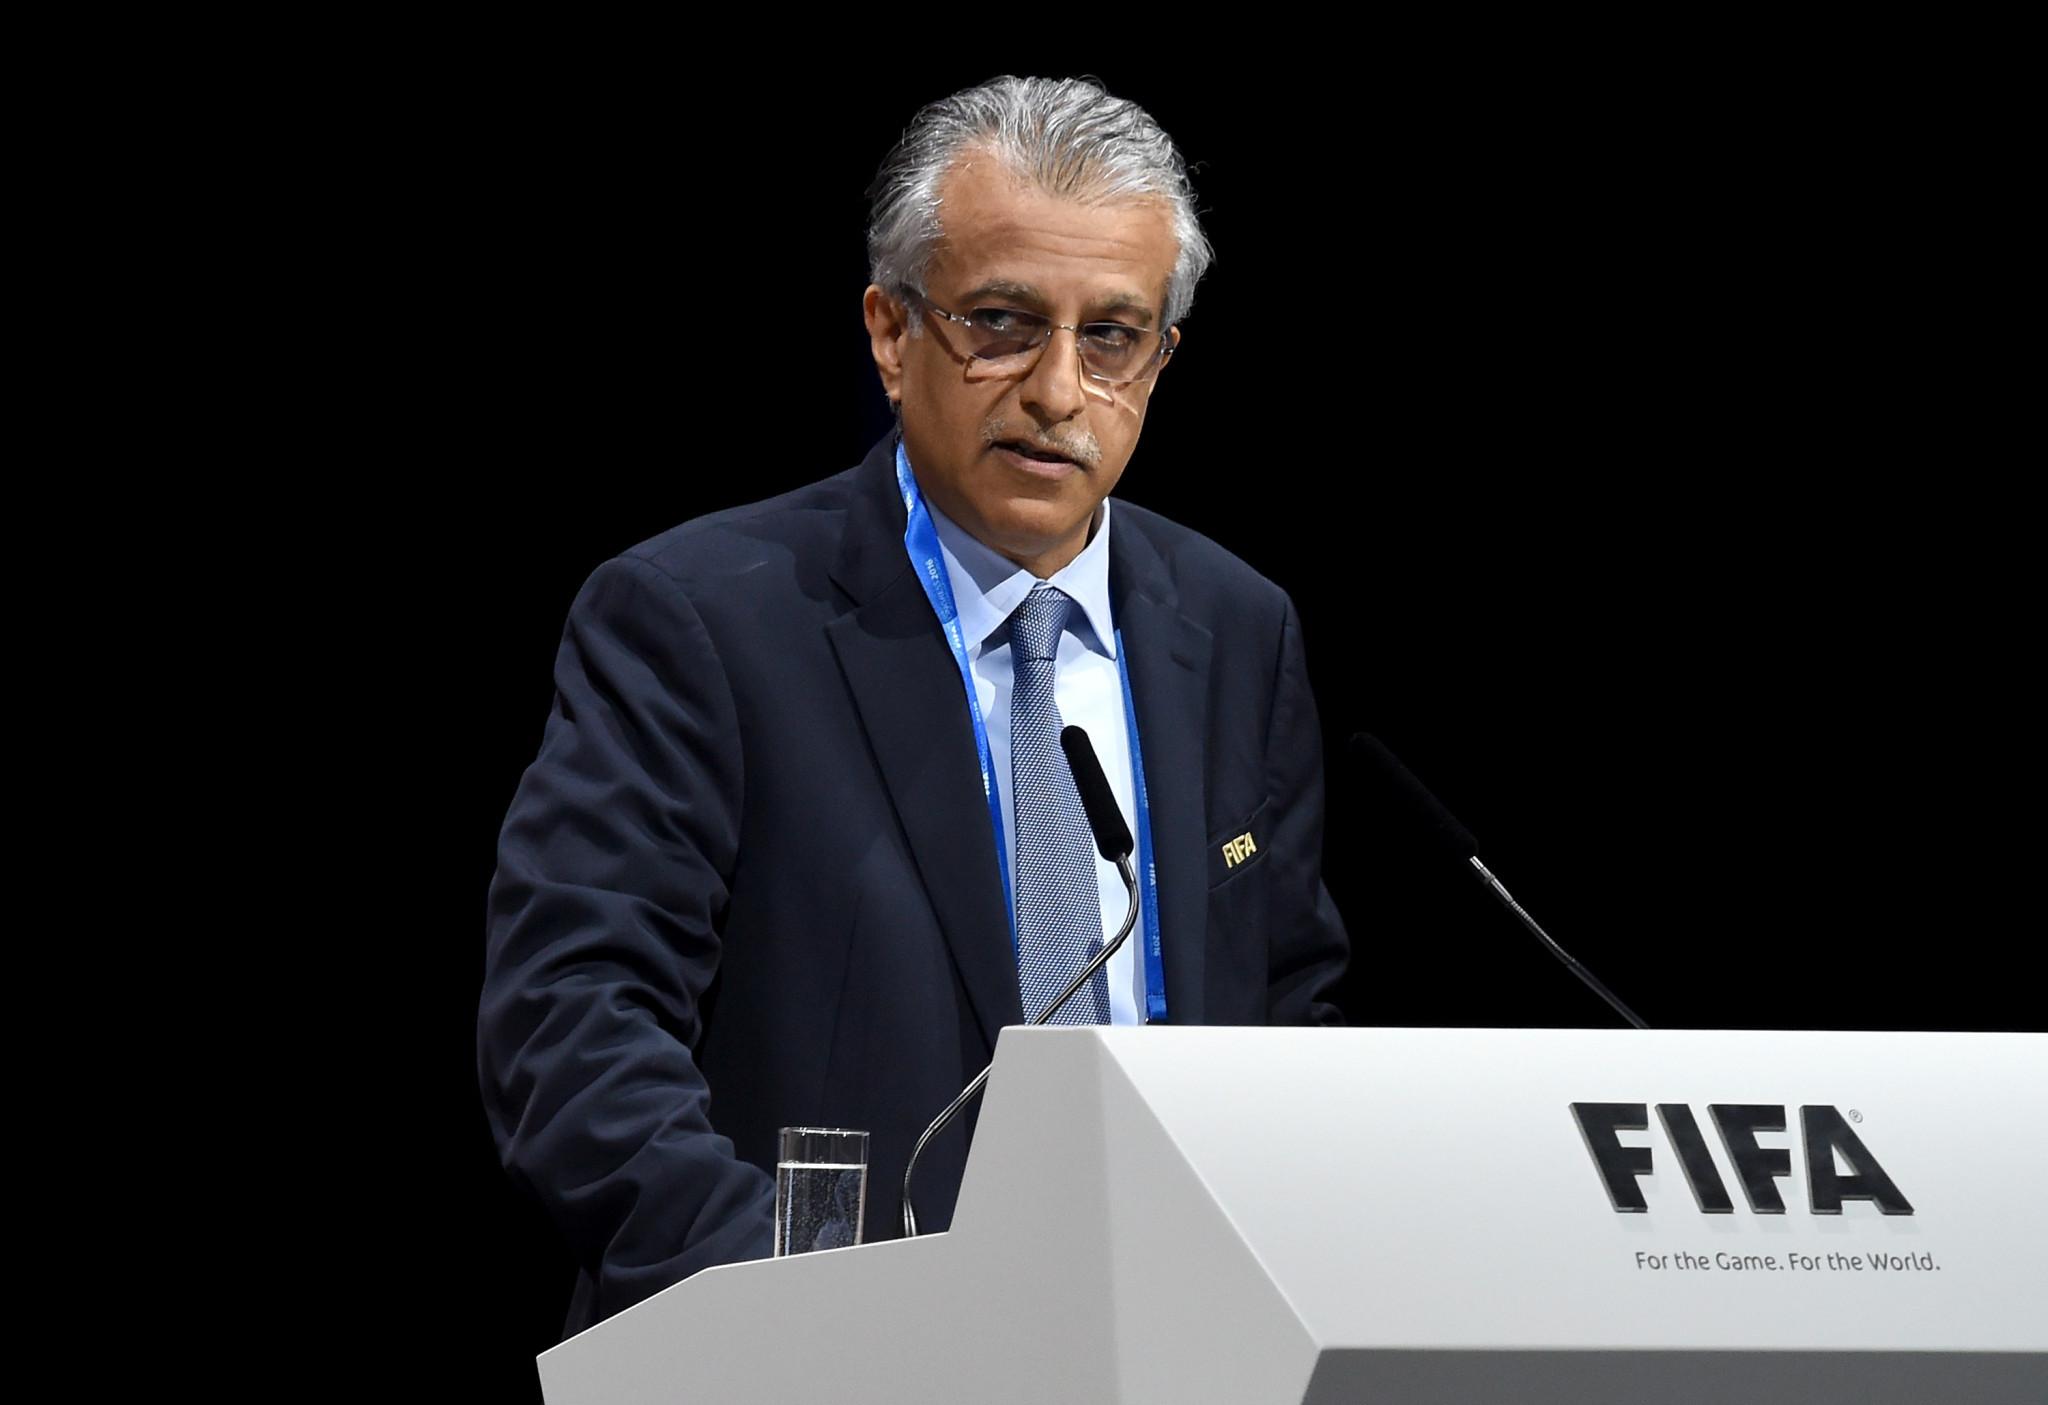 AFC President Shaikh Salman bin Ebrahim Al Khalifa endorsed the Australia and New Zealand joint bid for the 2023 FIFA Women's World Cup ©Getty Images